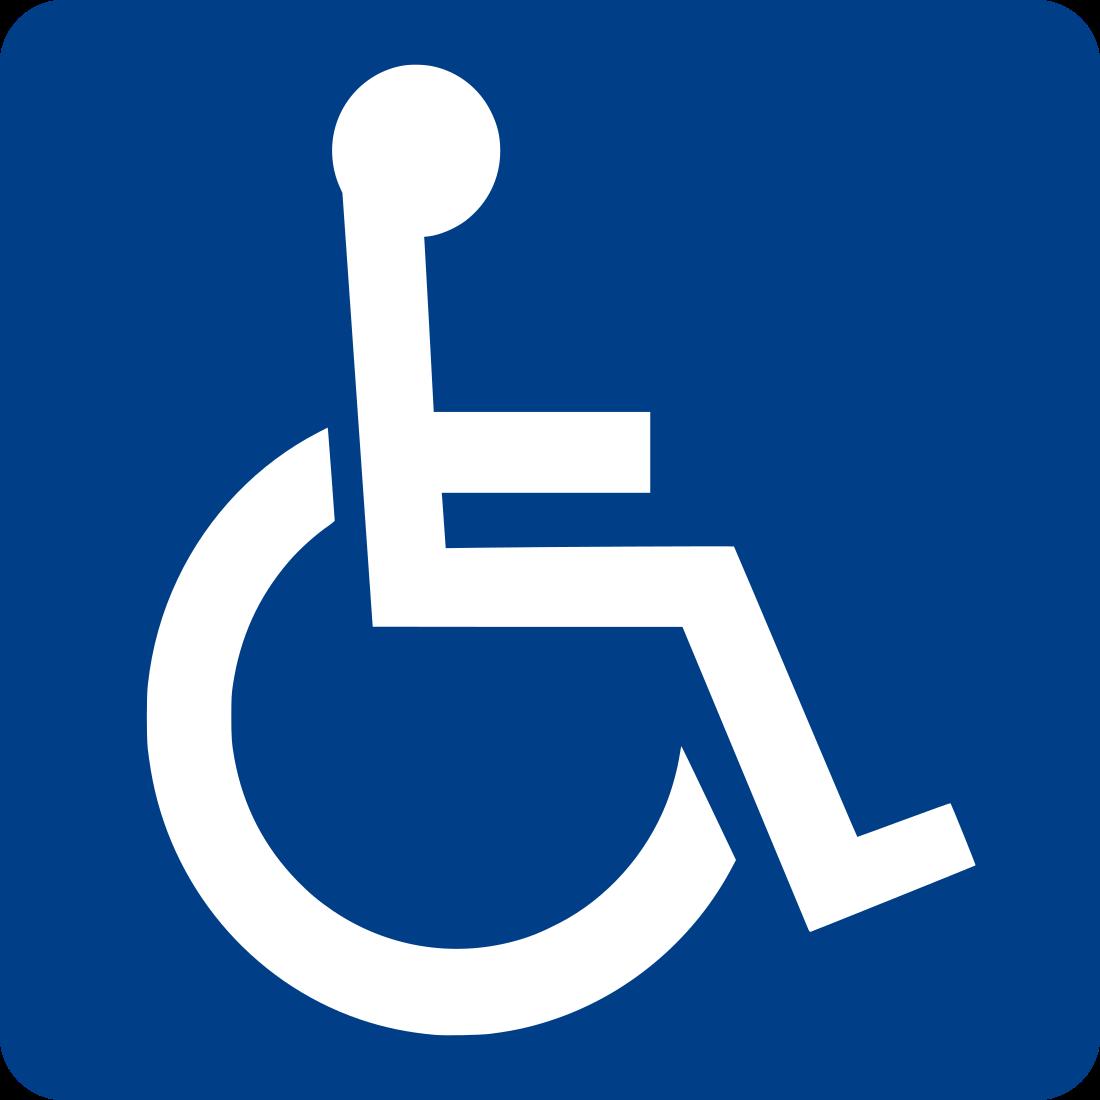 simbolo-cadeirante-acessibilidade-3